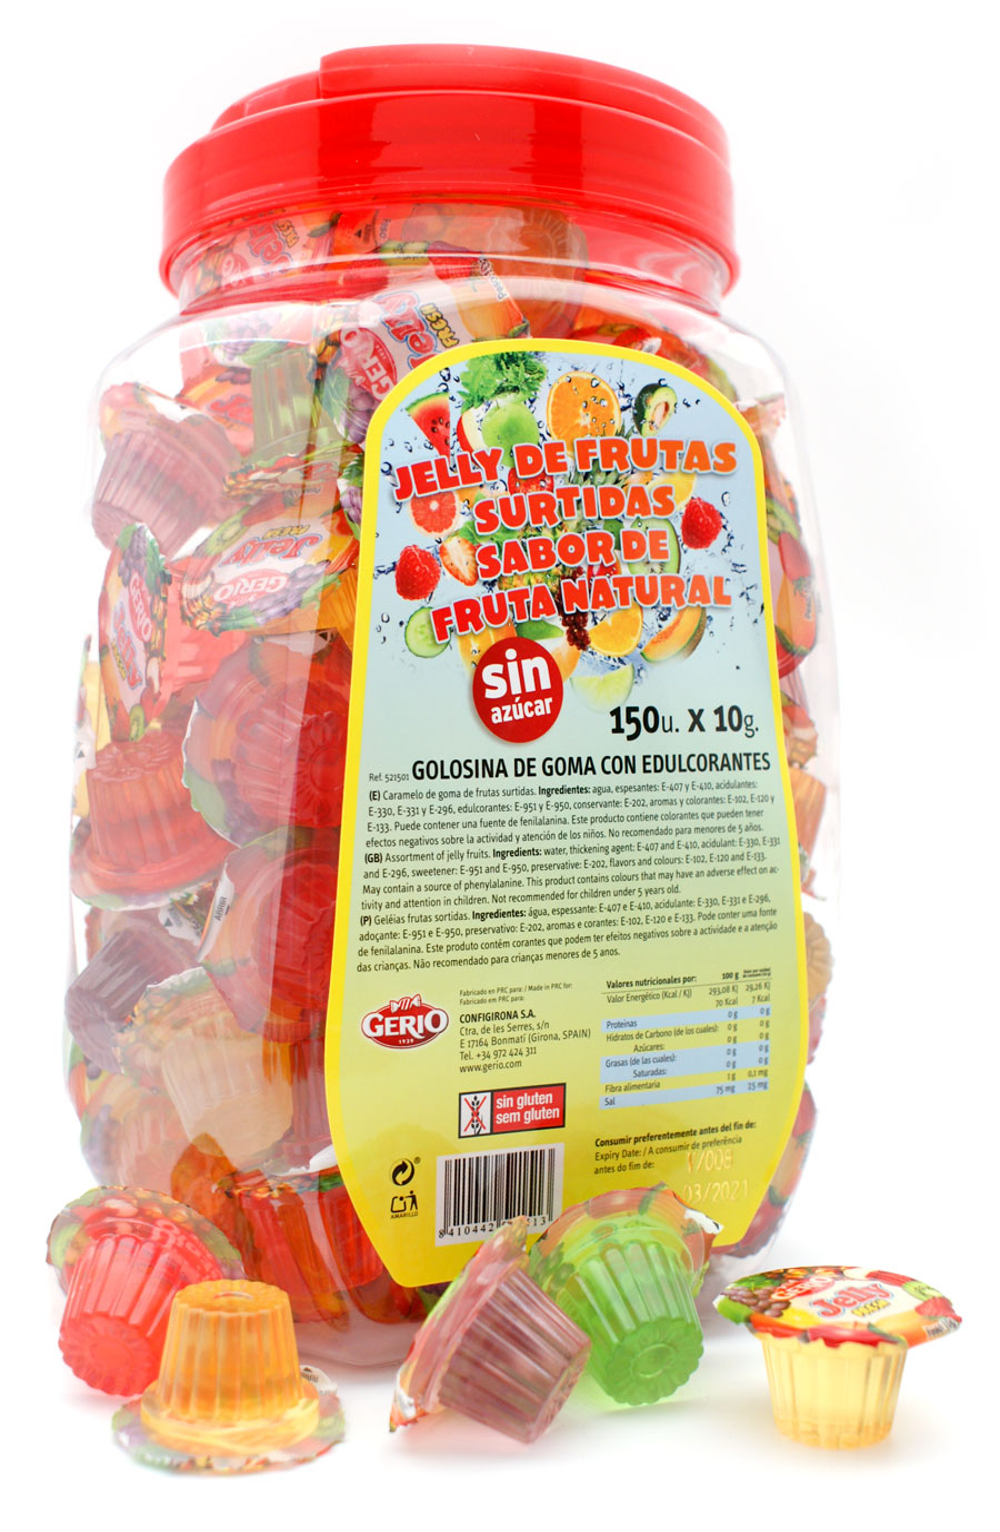 surtido jelly tarrinas sin azúcar